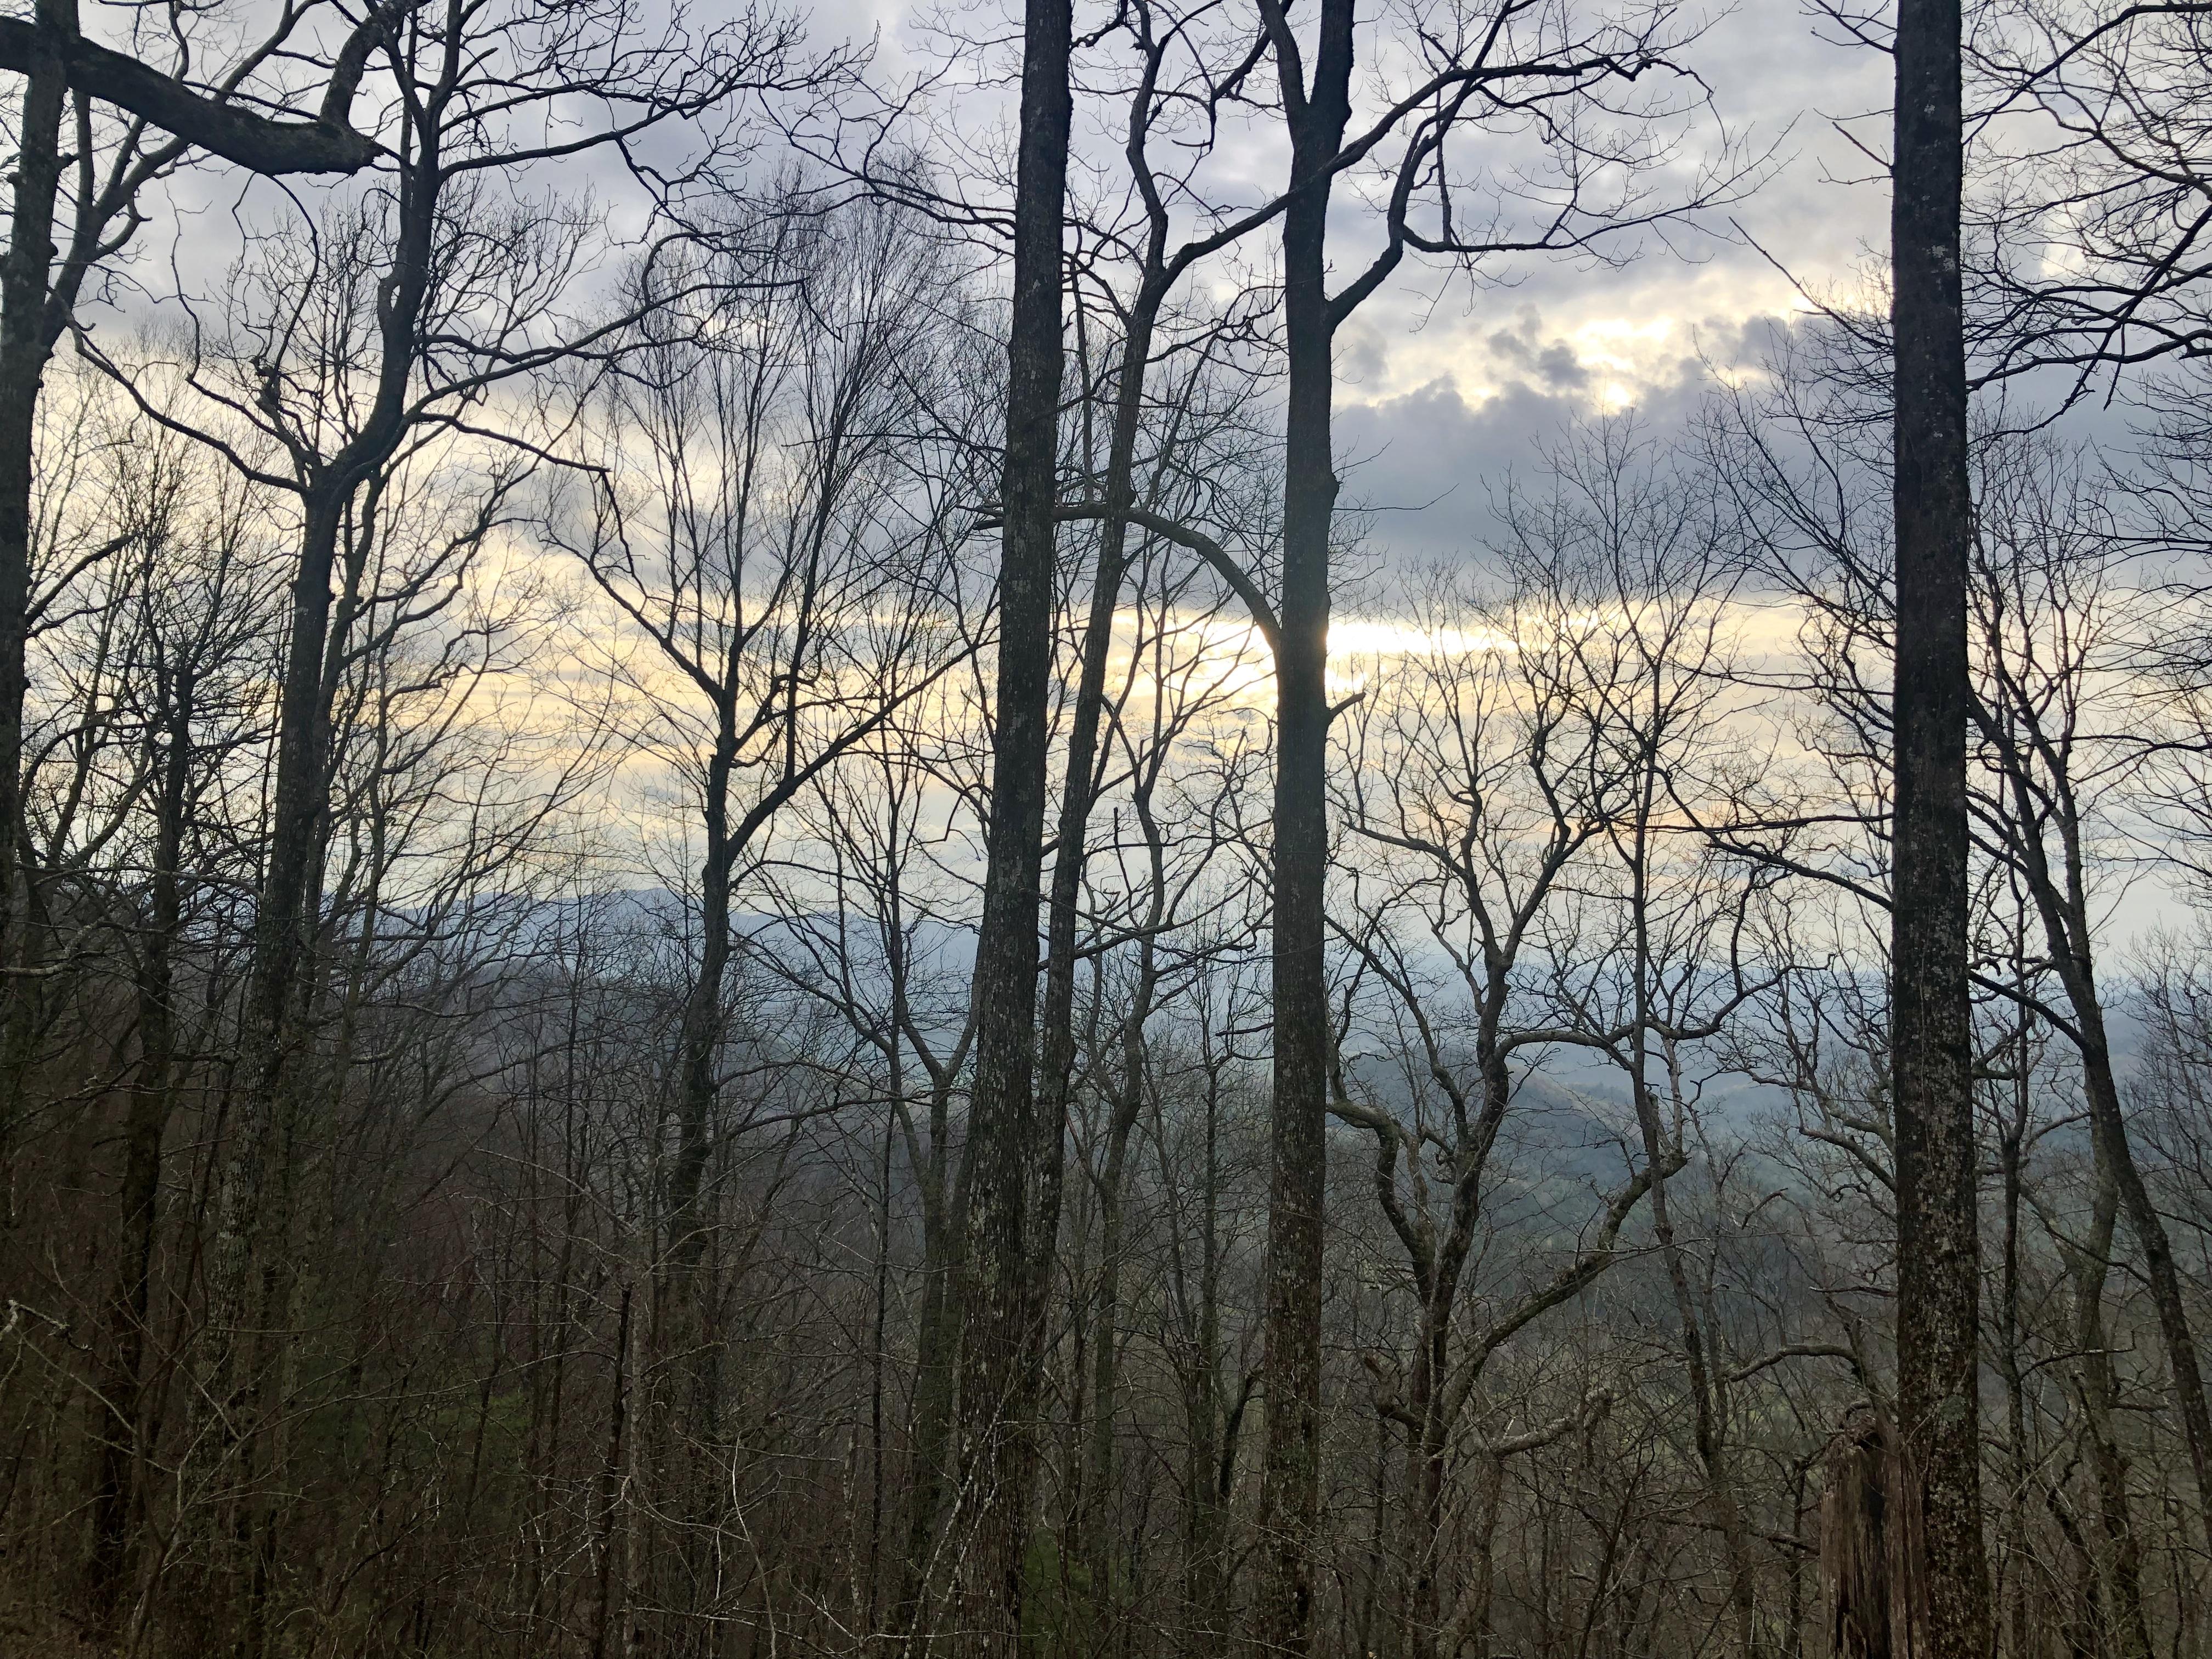 Steph's AT Hike Days 5-8: From Woody Gap to Hiawassee, GA